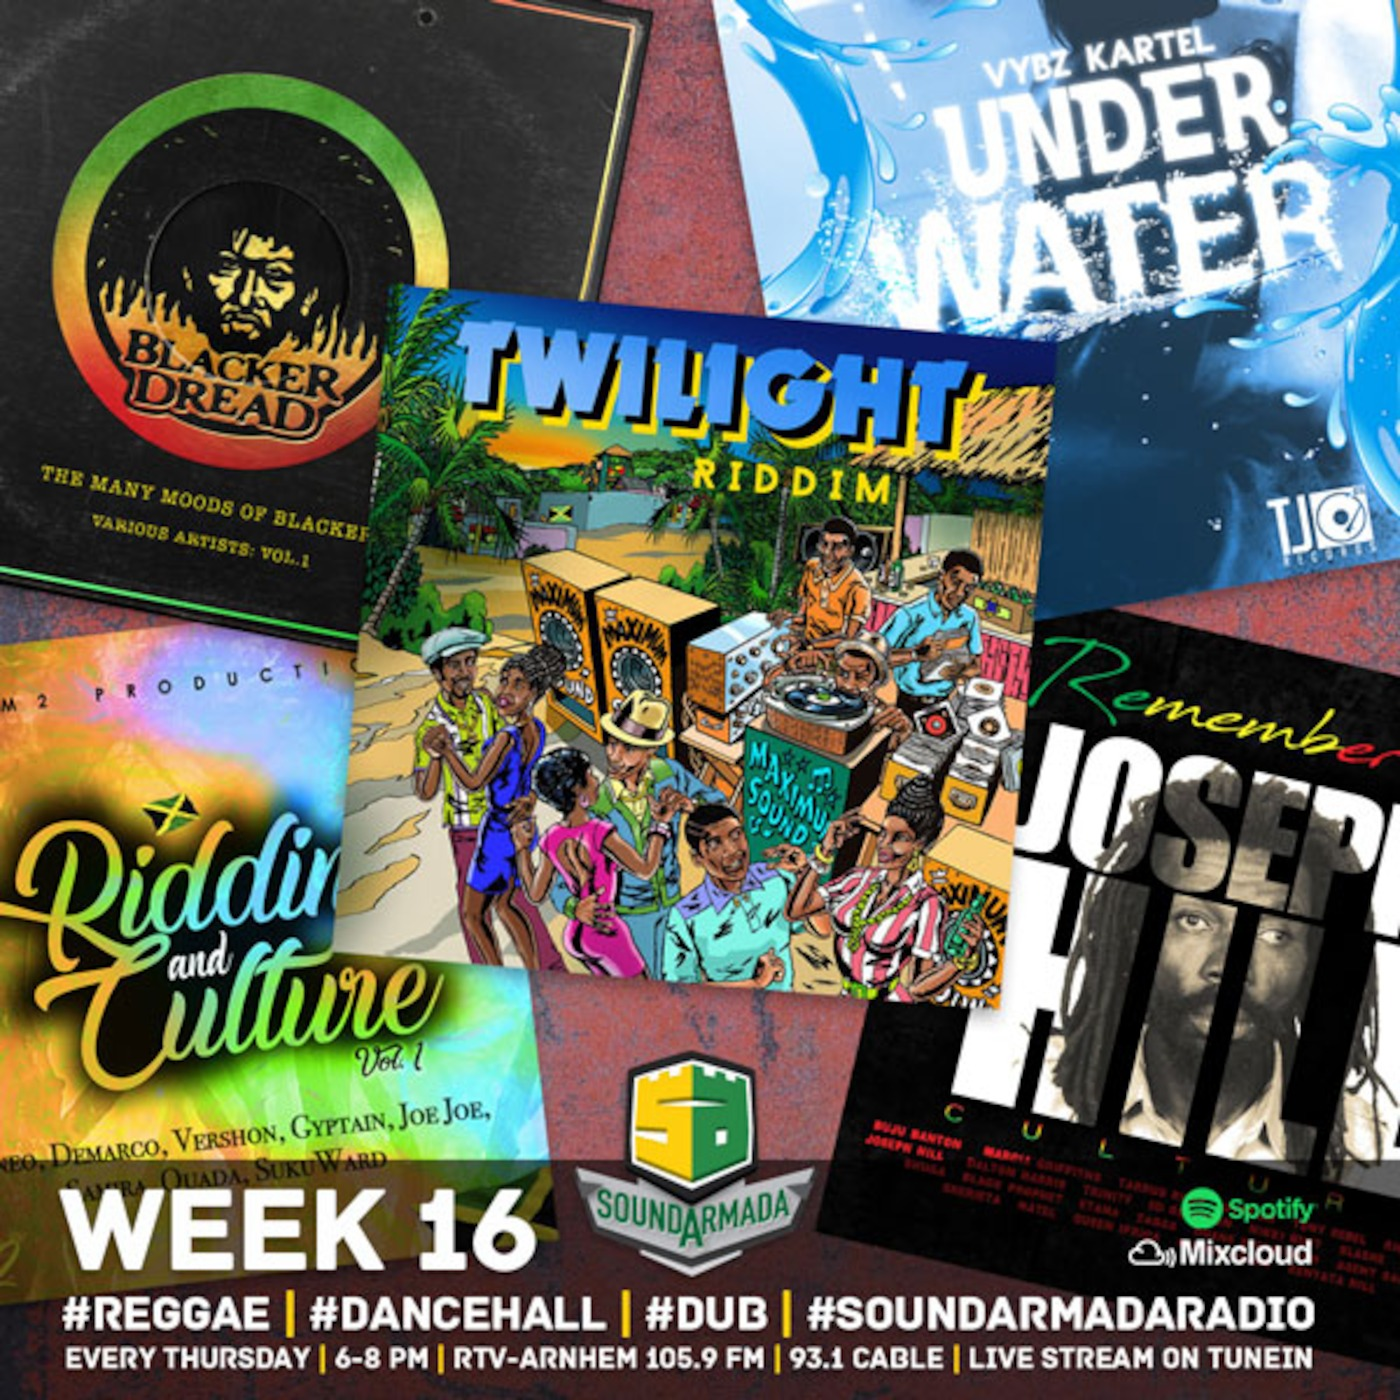 Sound Armada Reggae Dancehall Radio Week 16 2018 SOUND ARMADA RADIO